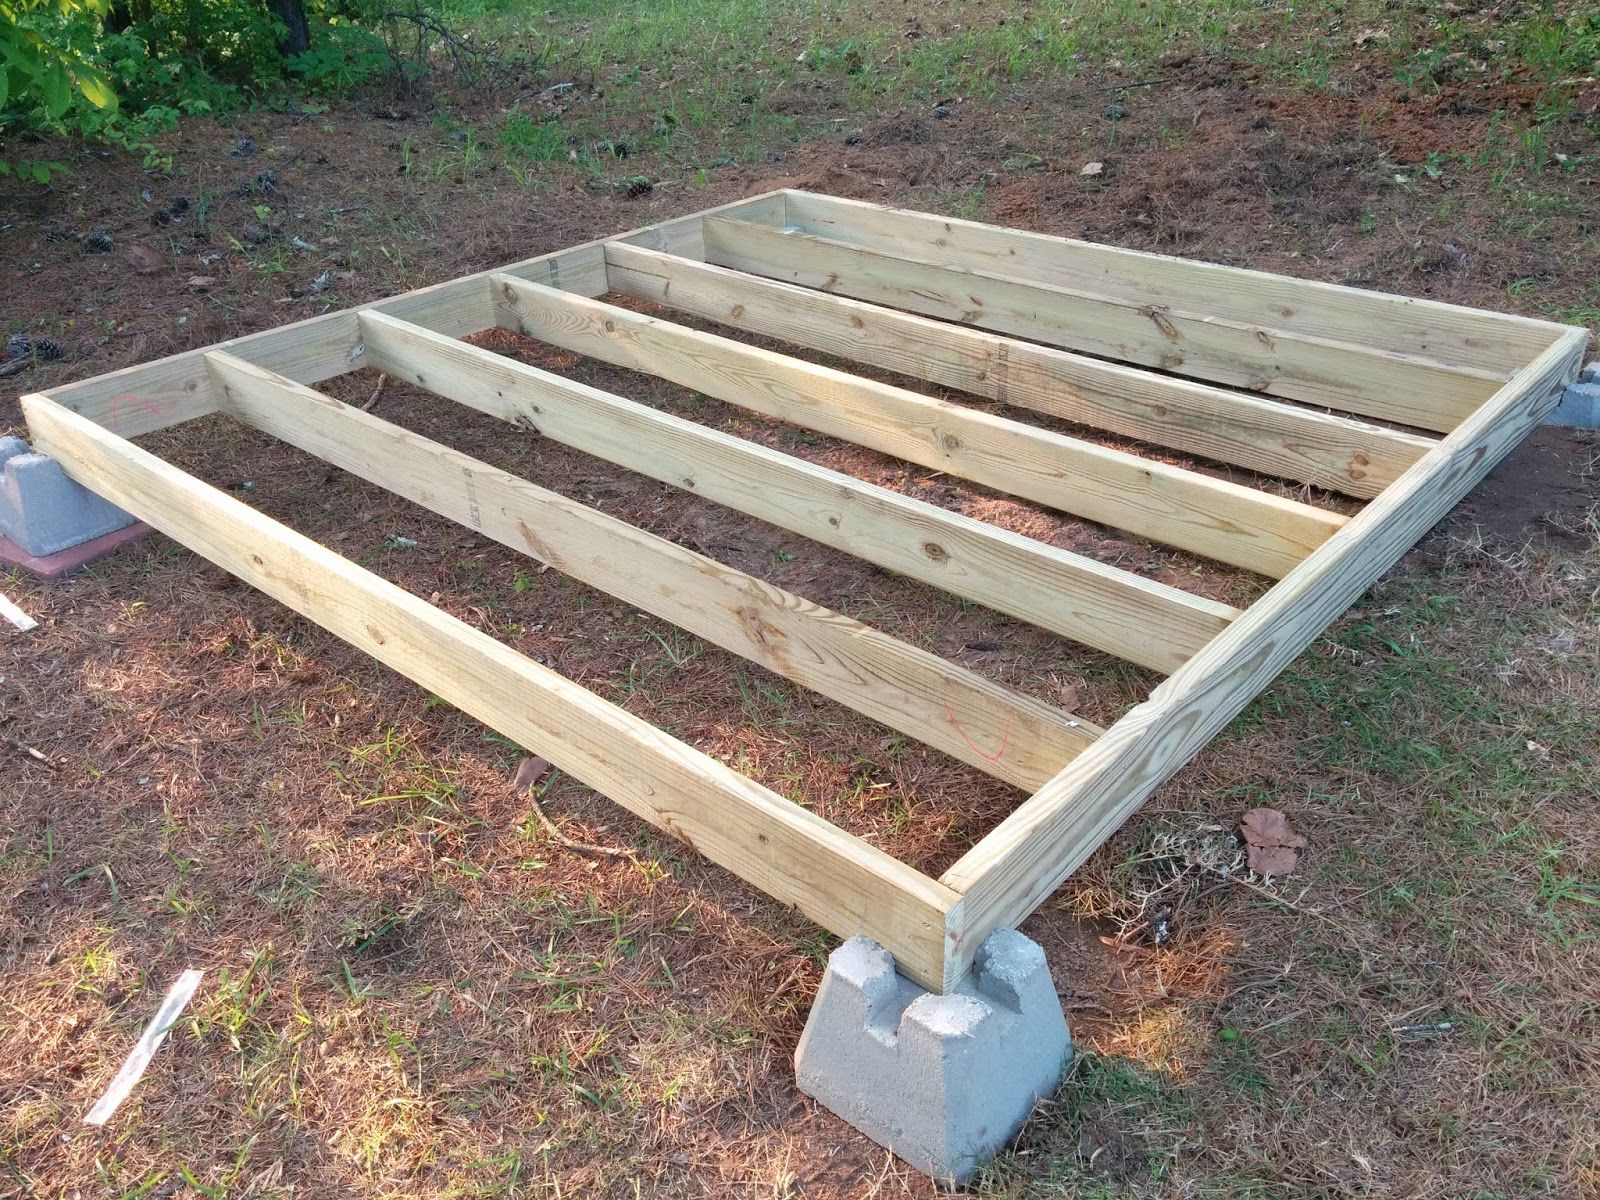 12x12 Floating Deck Plans 28 Images How To Build A Concrete Slab Patio Cost Floating Deck Plans Floating Deck Building A Deck